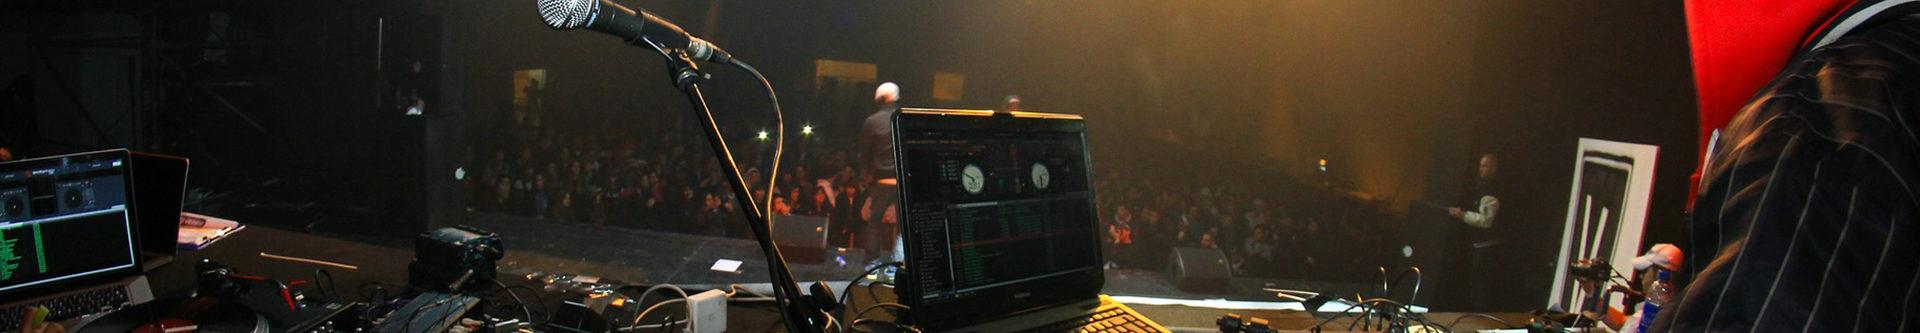 planet phatt hip hop soundfonts